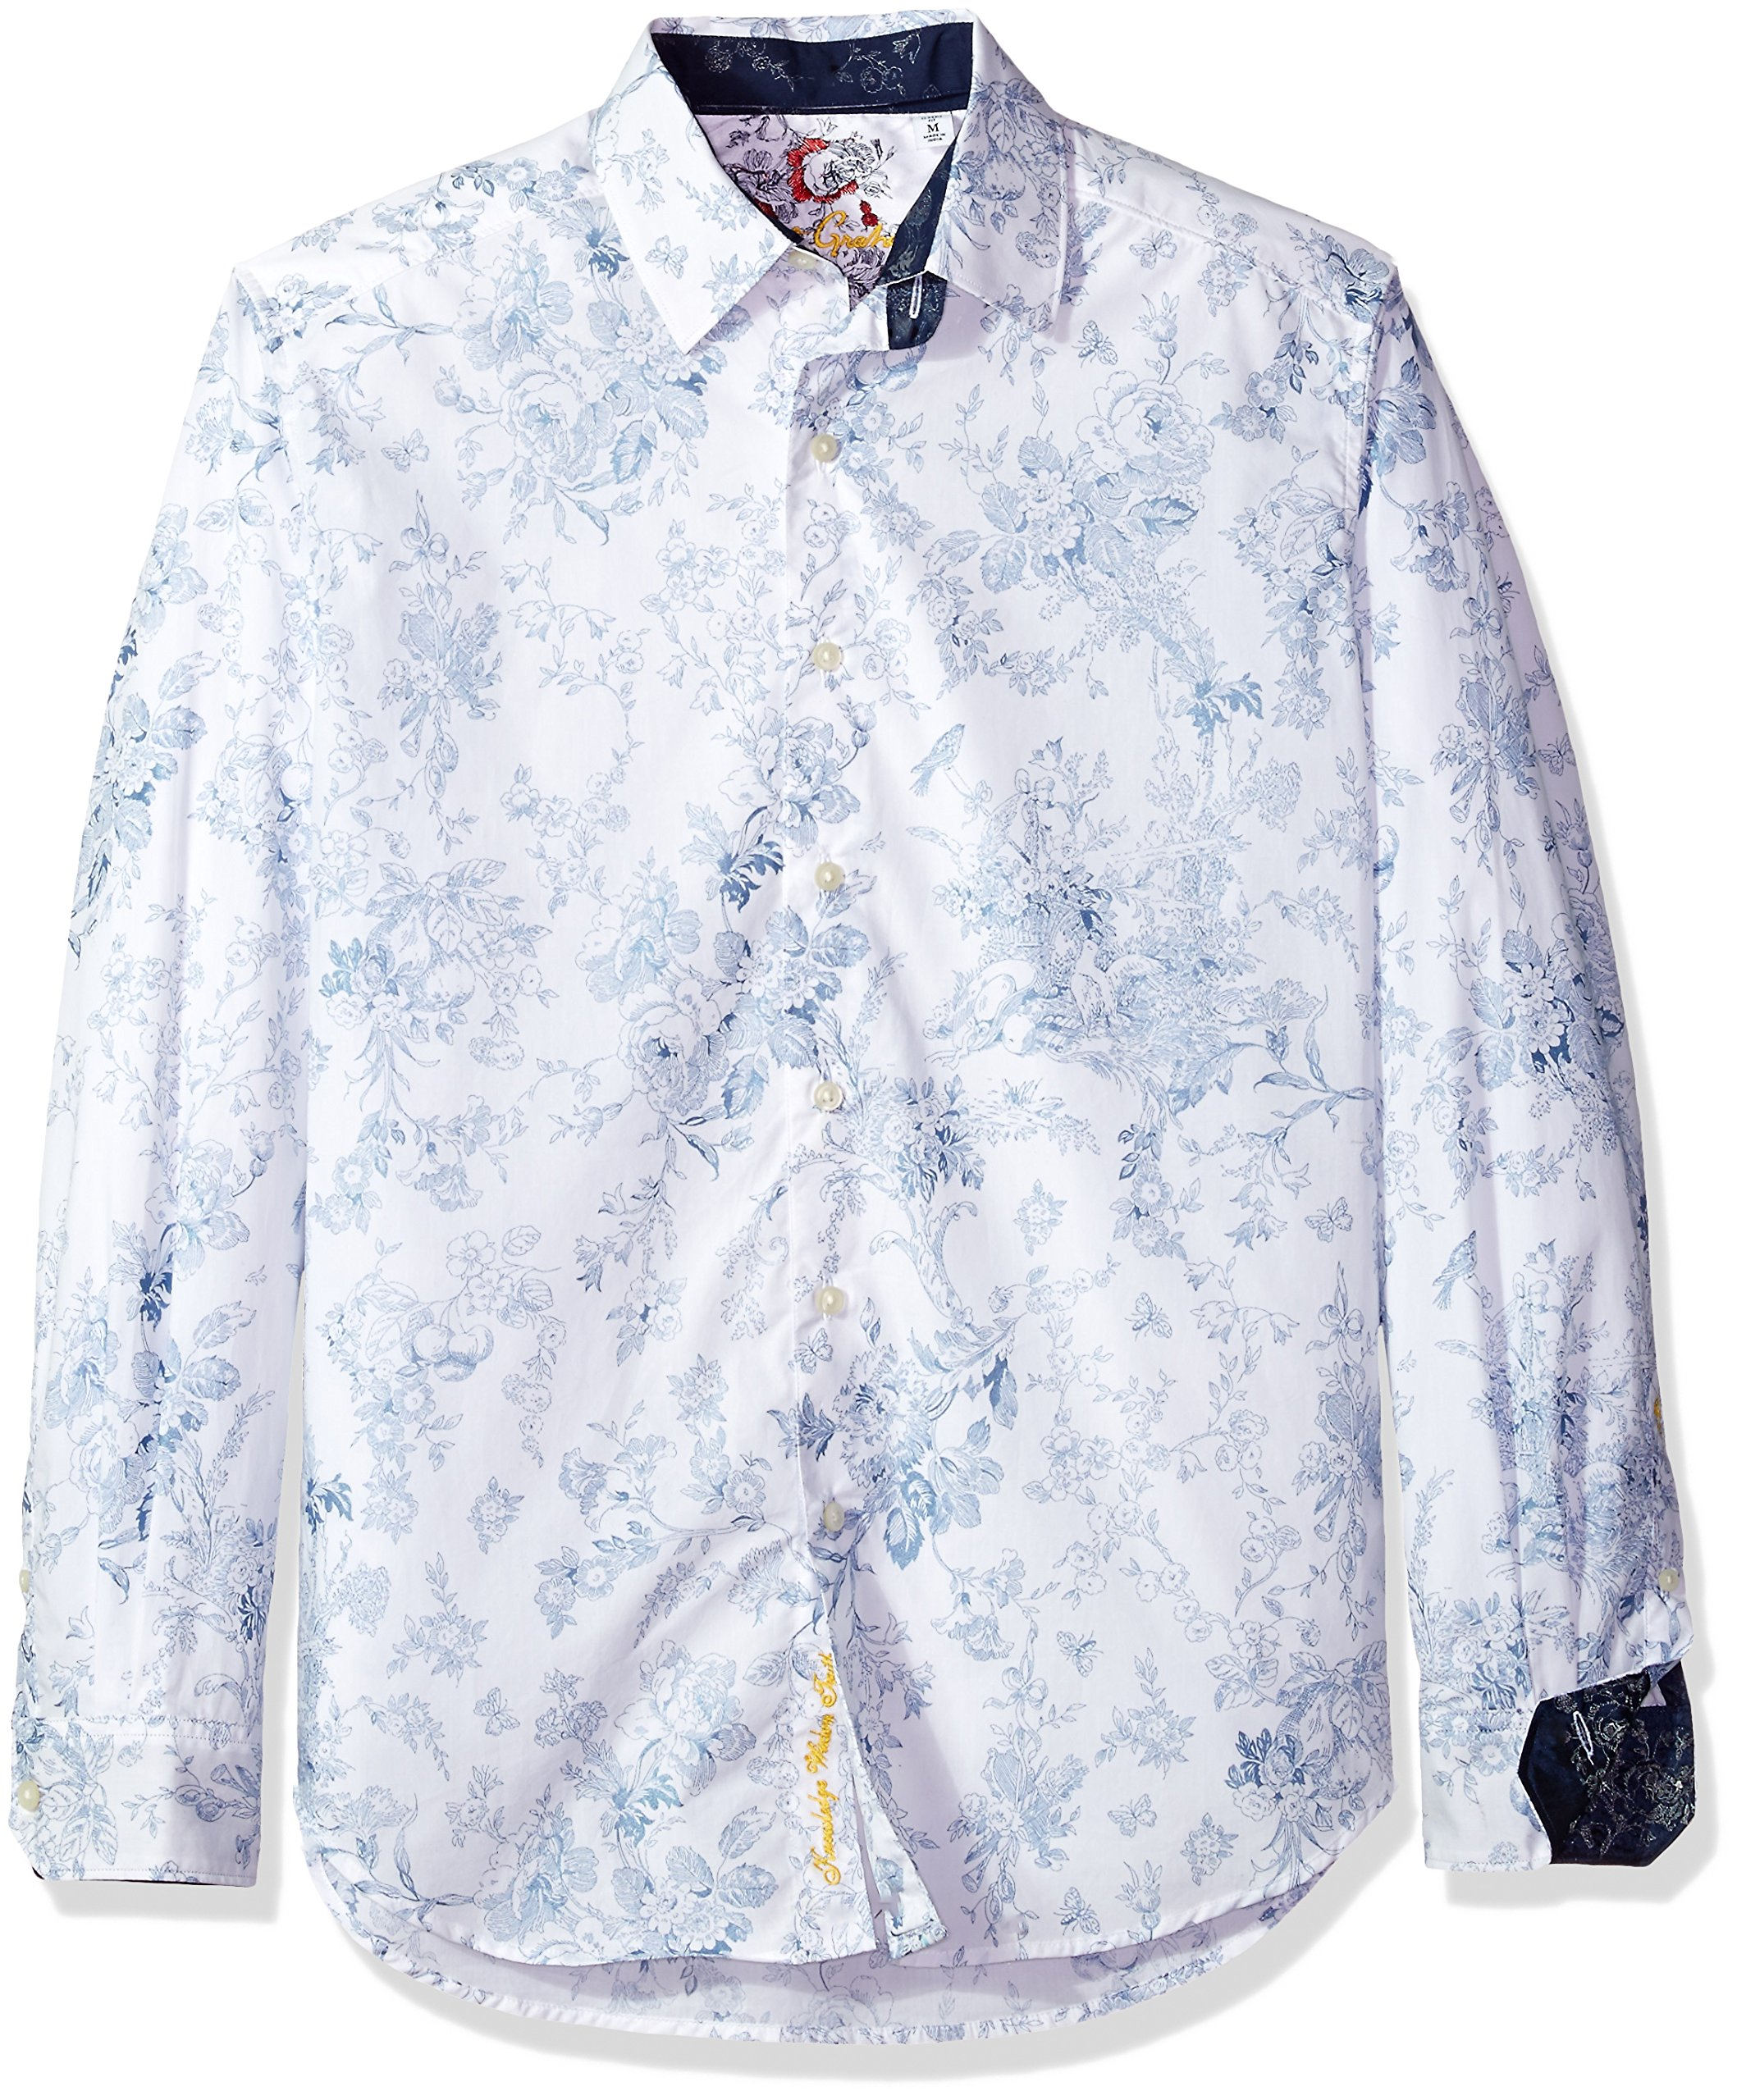 Robert Graham Men's Rider Classic Fit Cotton Sport Shirt, White, Large